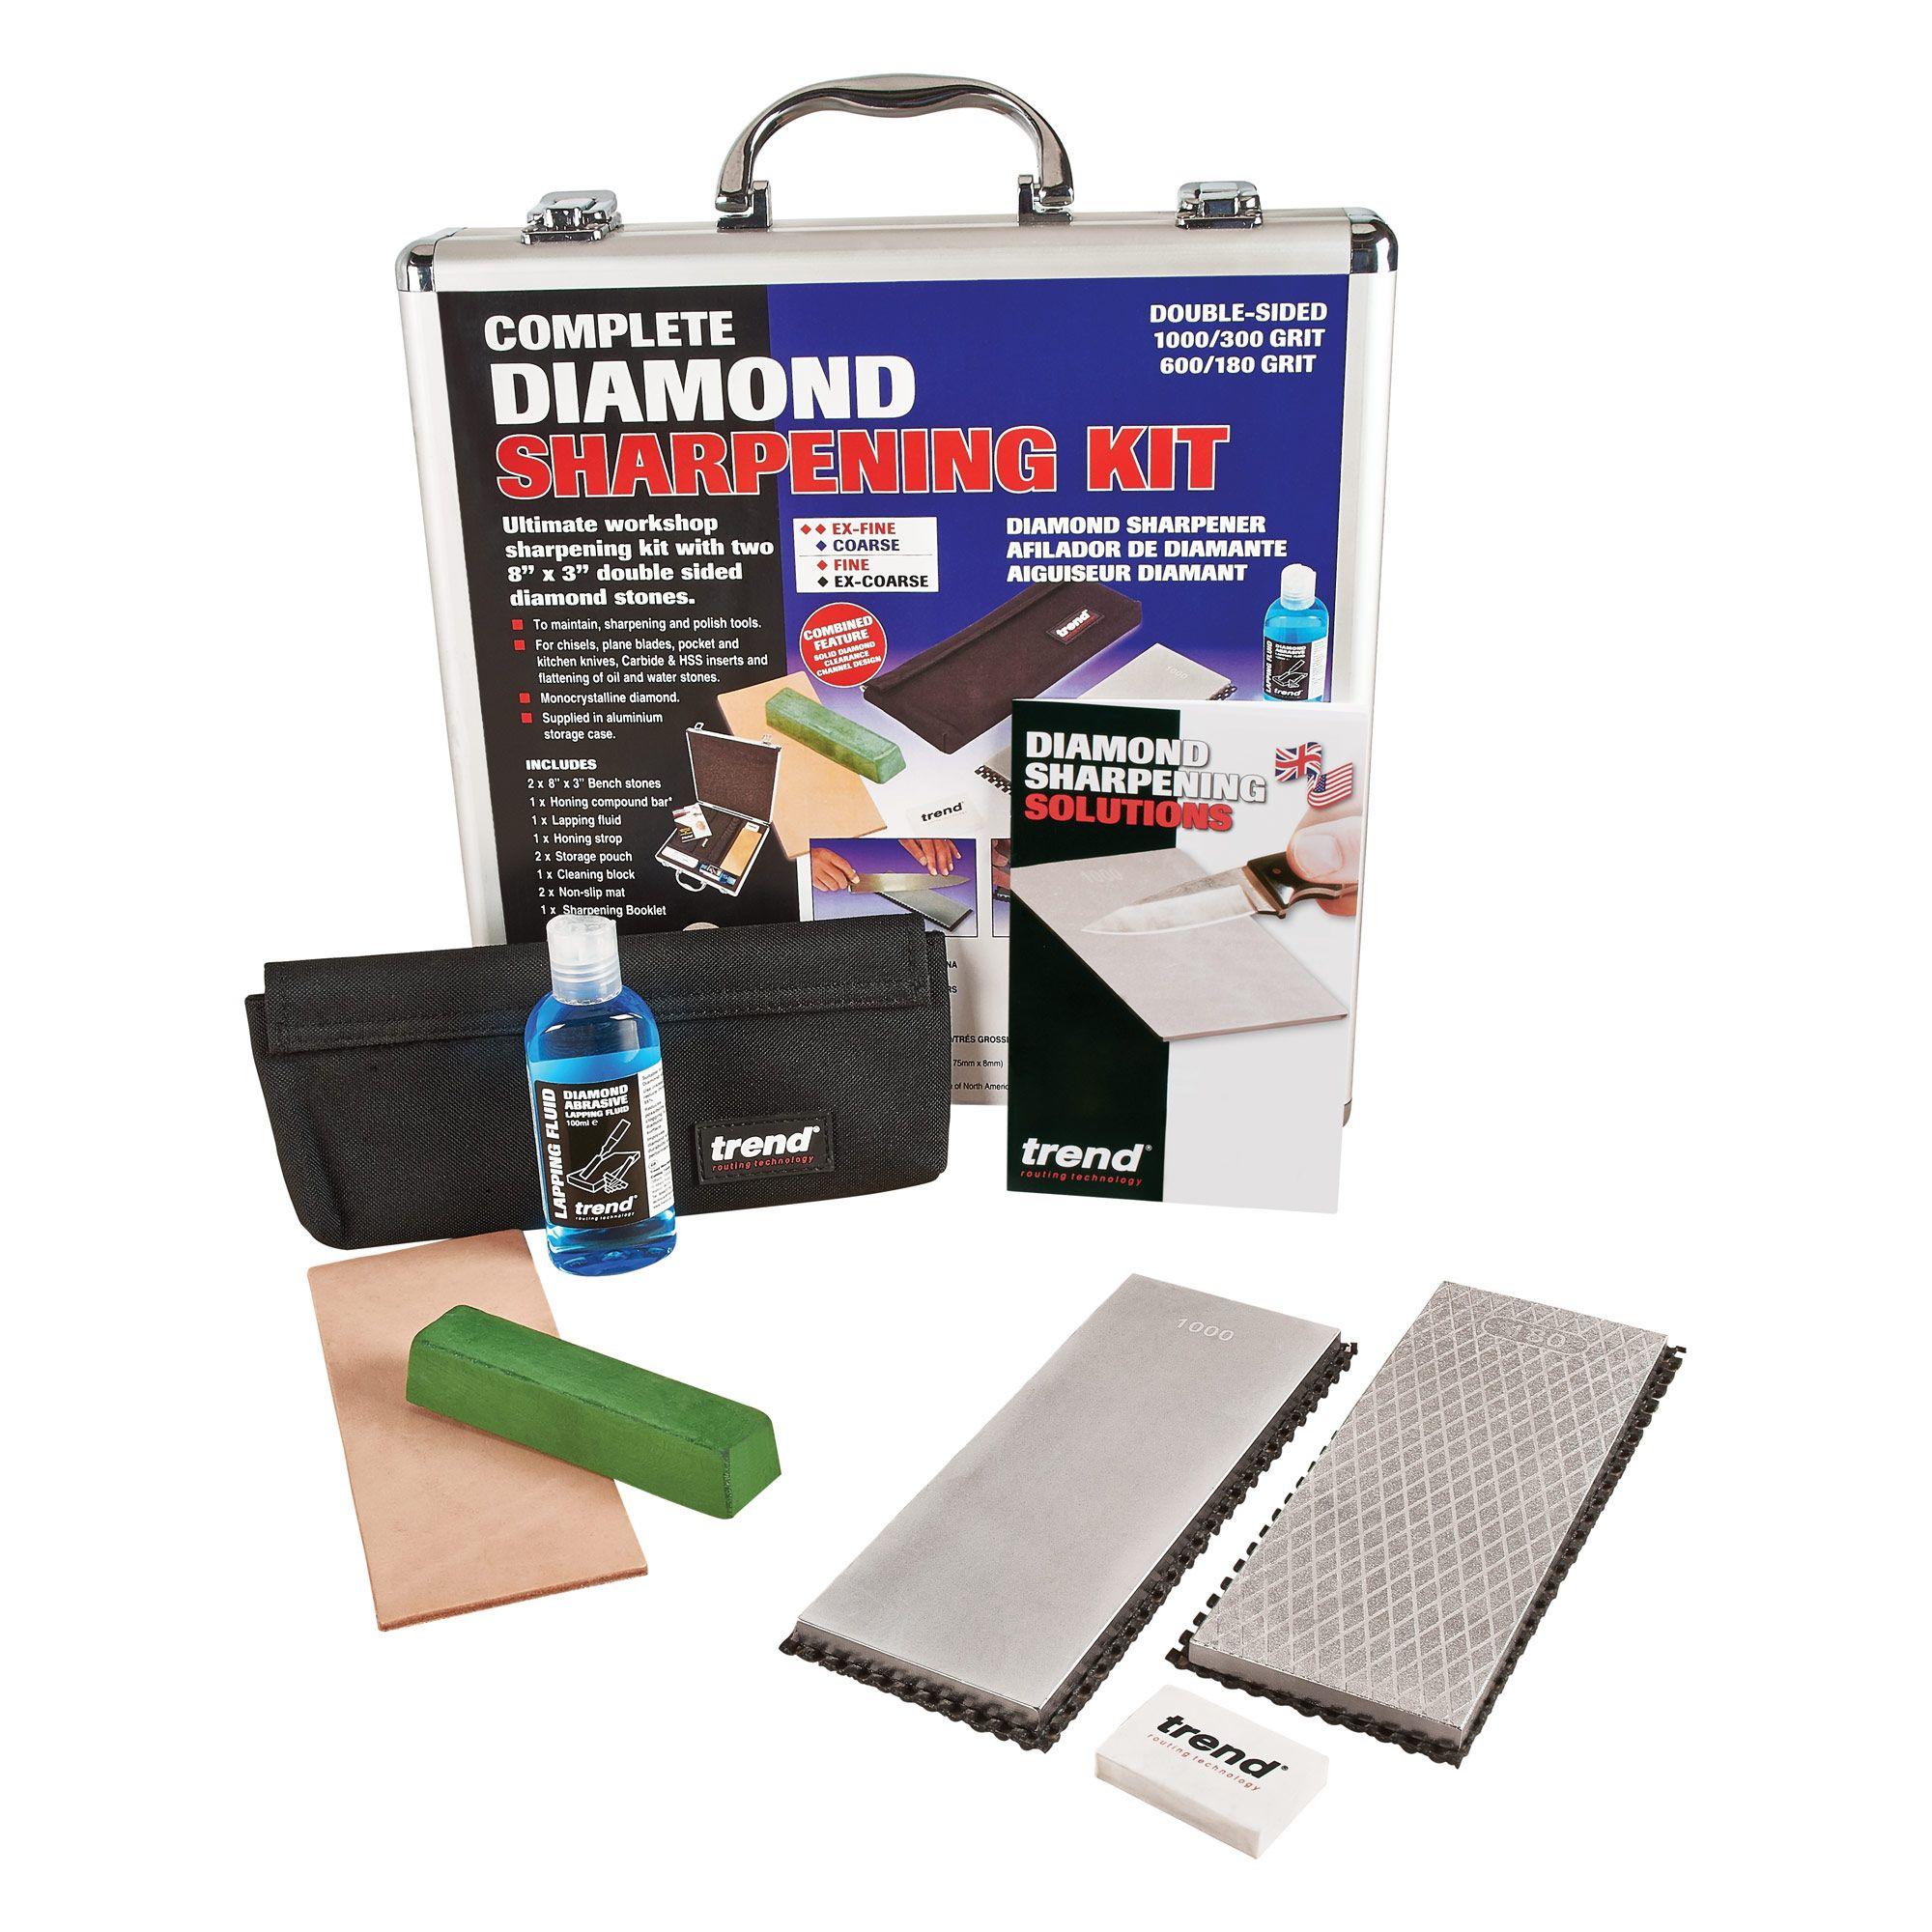 TREND DIAMOND SHARPENING KIT - LIMITED EDITION